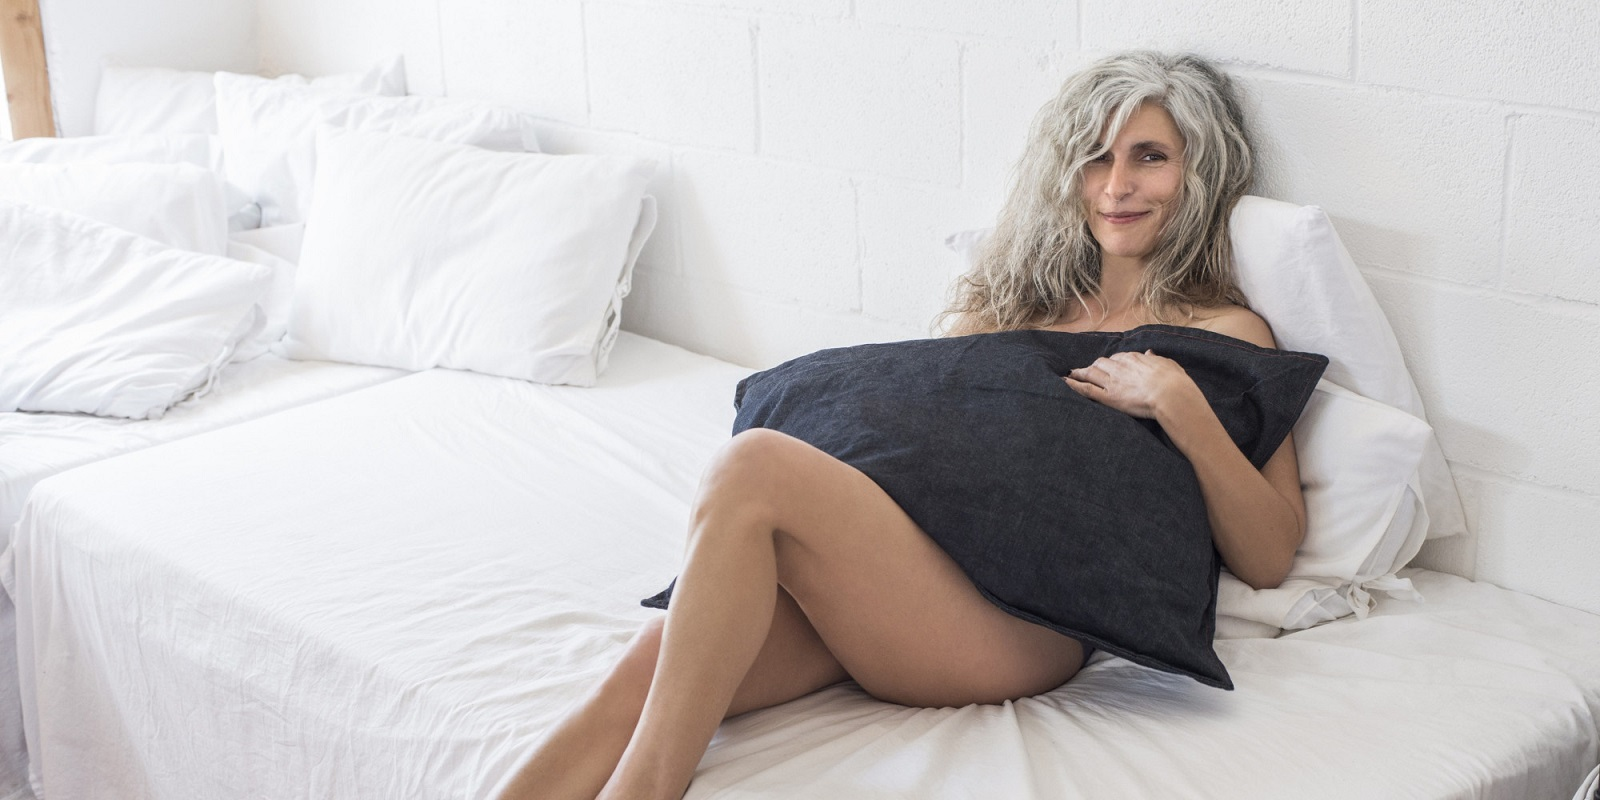 Zralé obrázky MILF sex